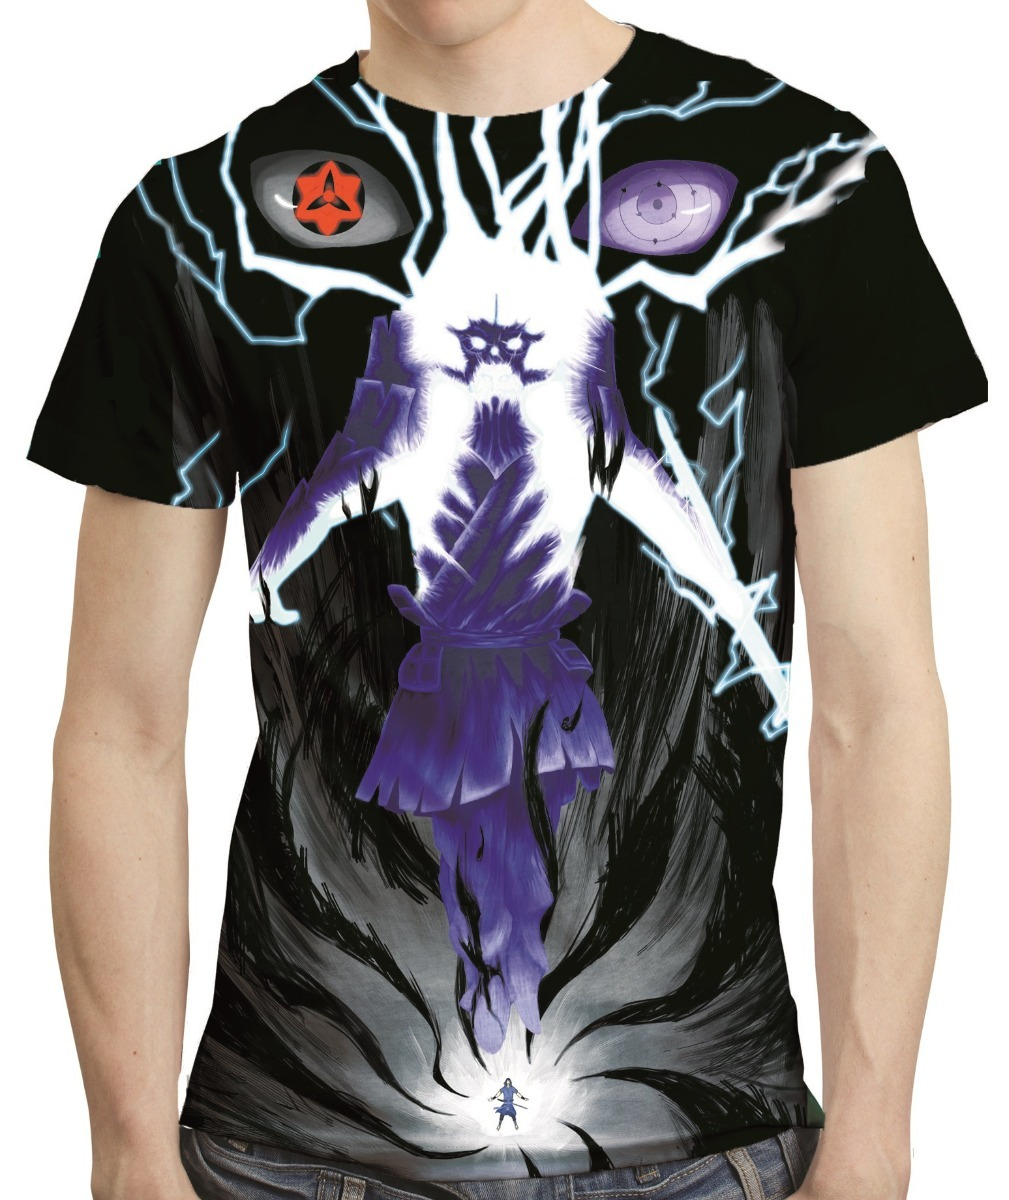 d8198b2fa camisa naruto camiseta sasuke itachi susanoo - estampa total. Carregando  zoom.